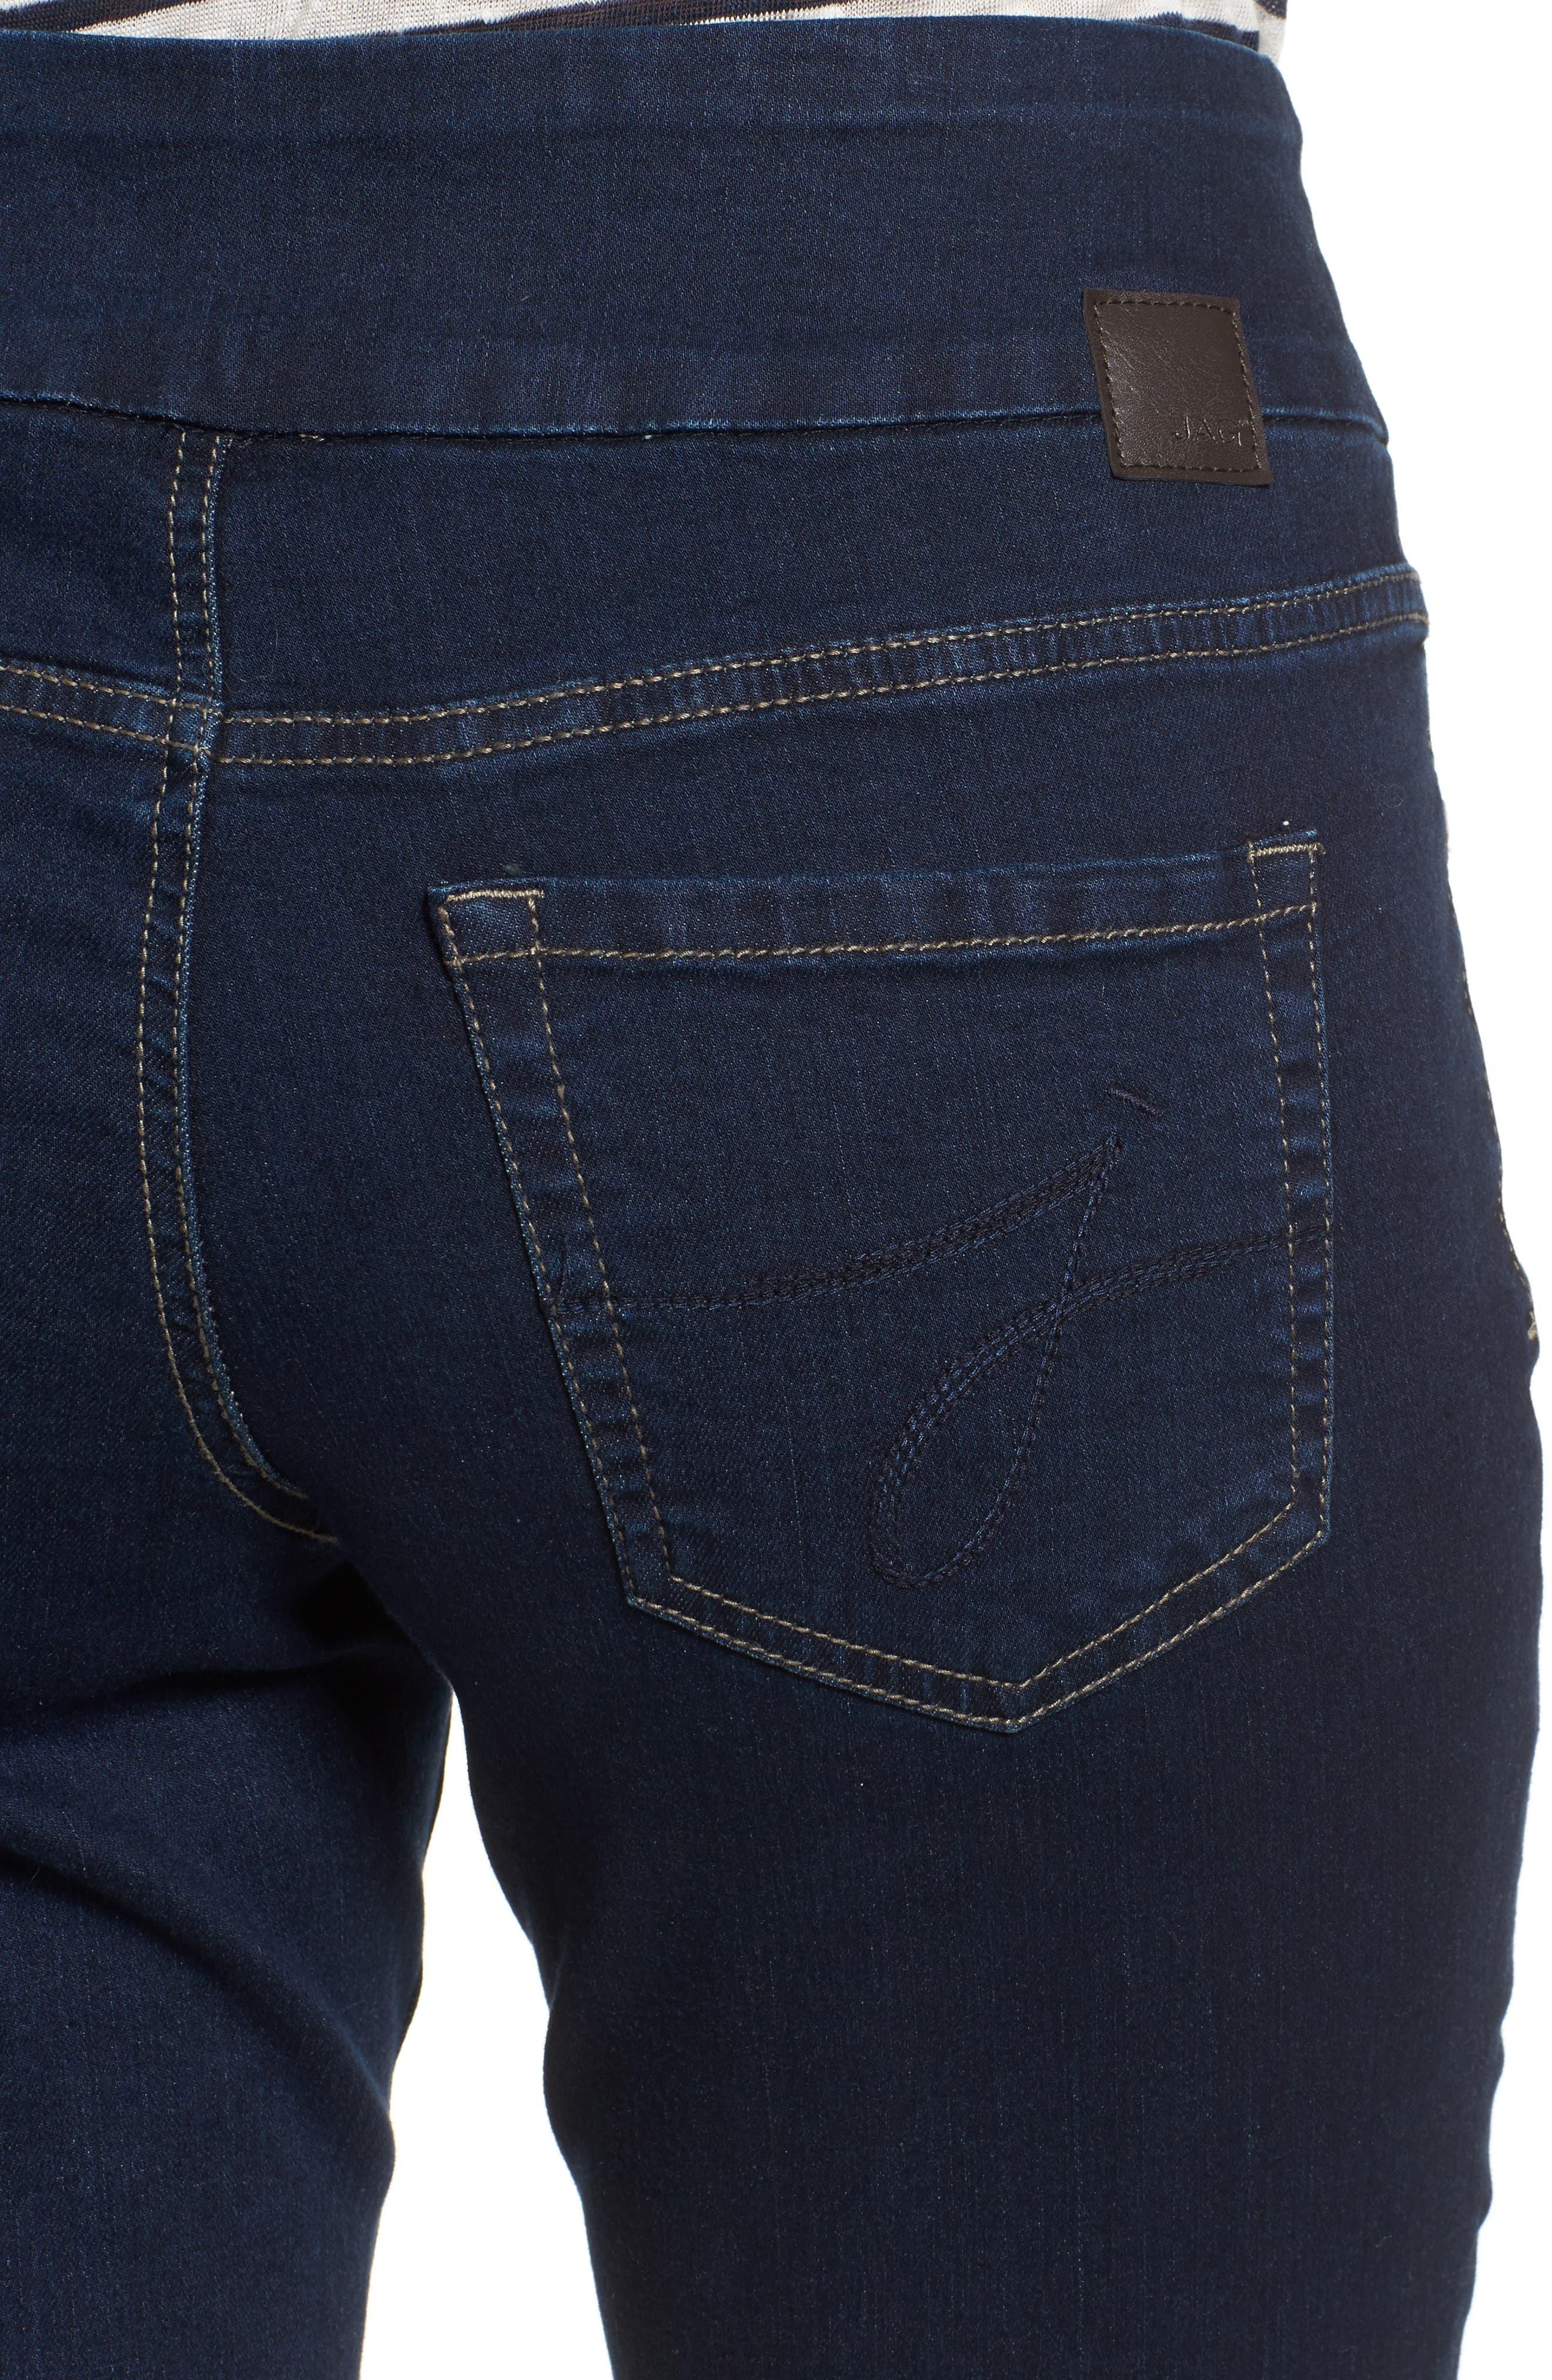 Peri Pull-On Straight Leg Jeans,                             Alternate thumbnail 4, color,                             DARK INDIGO